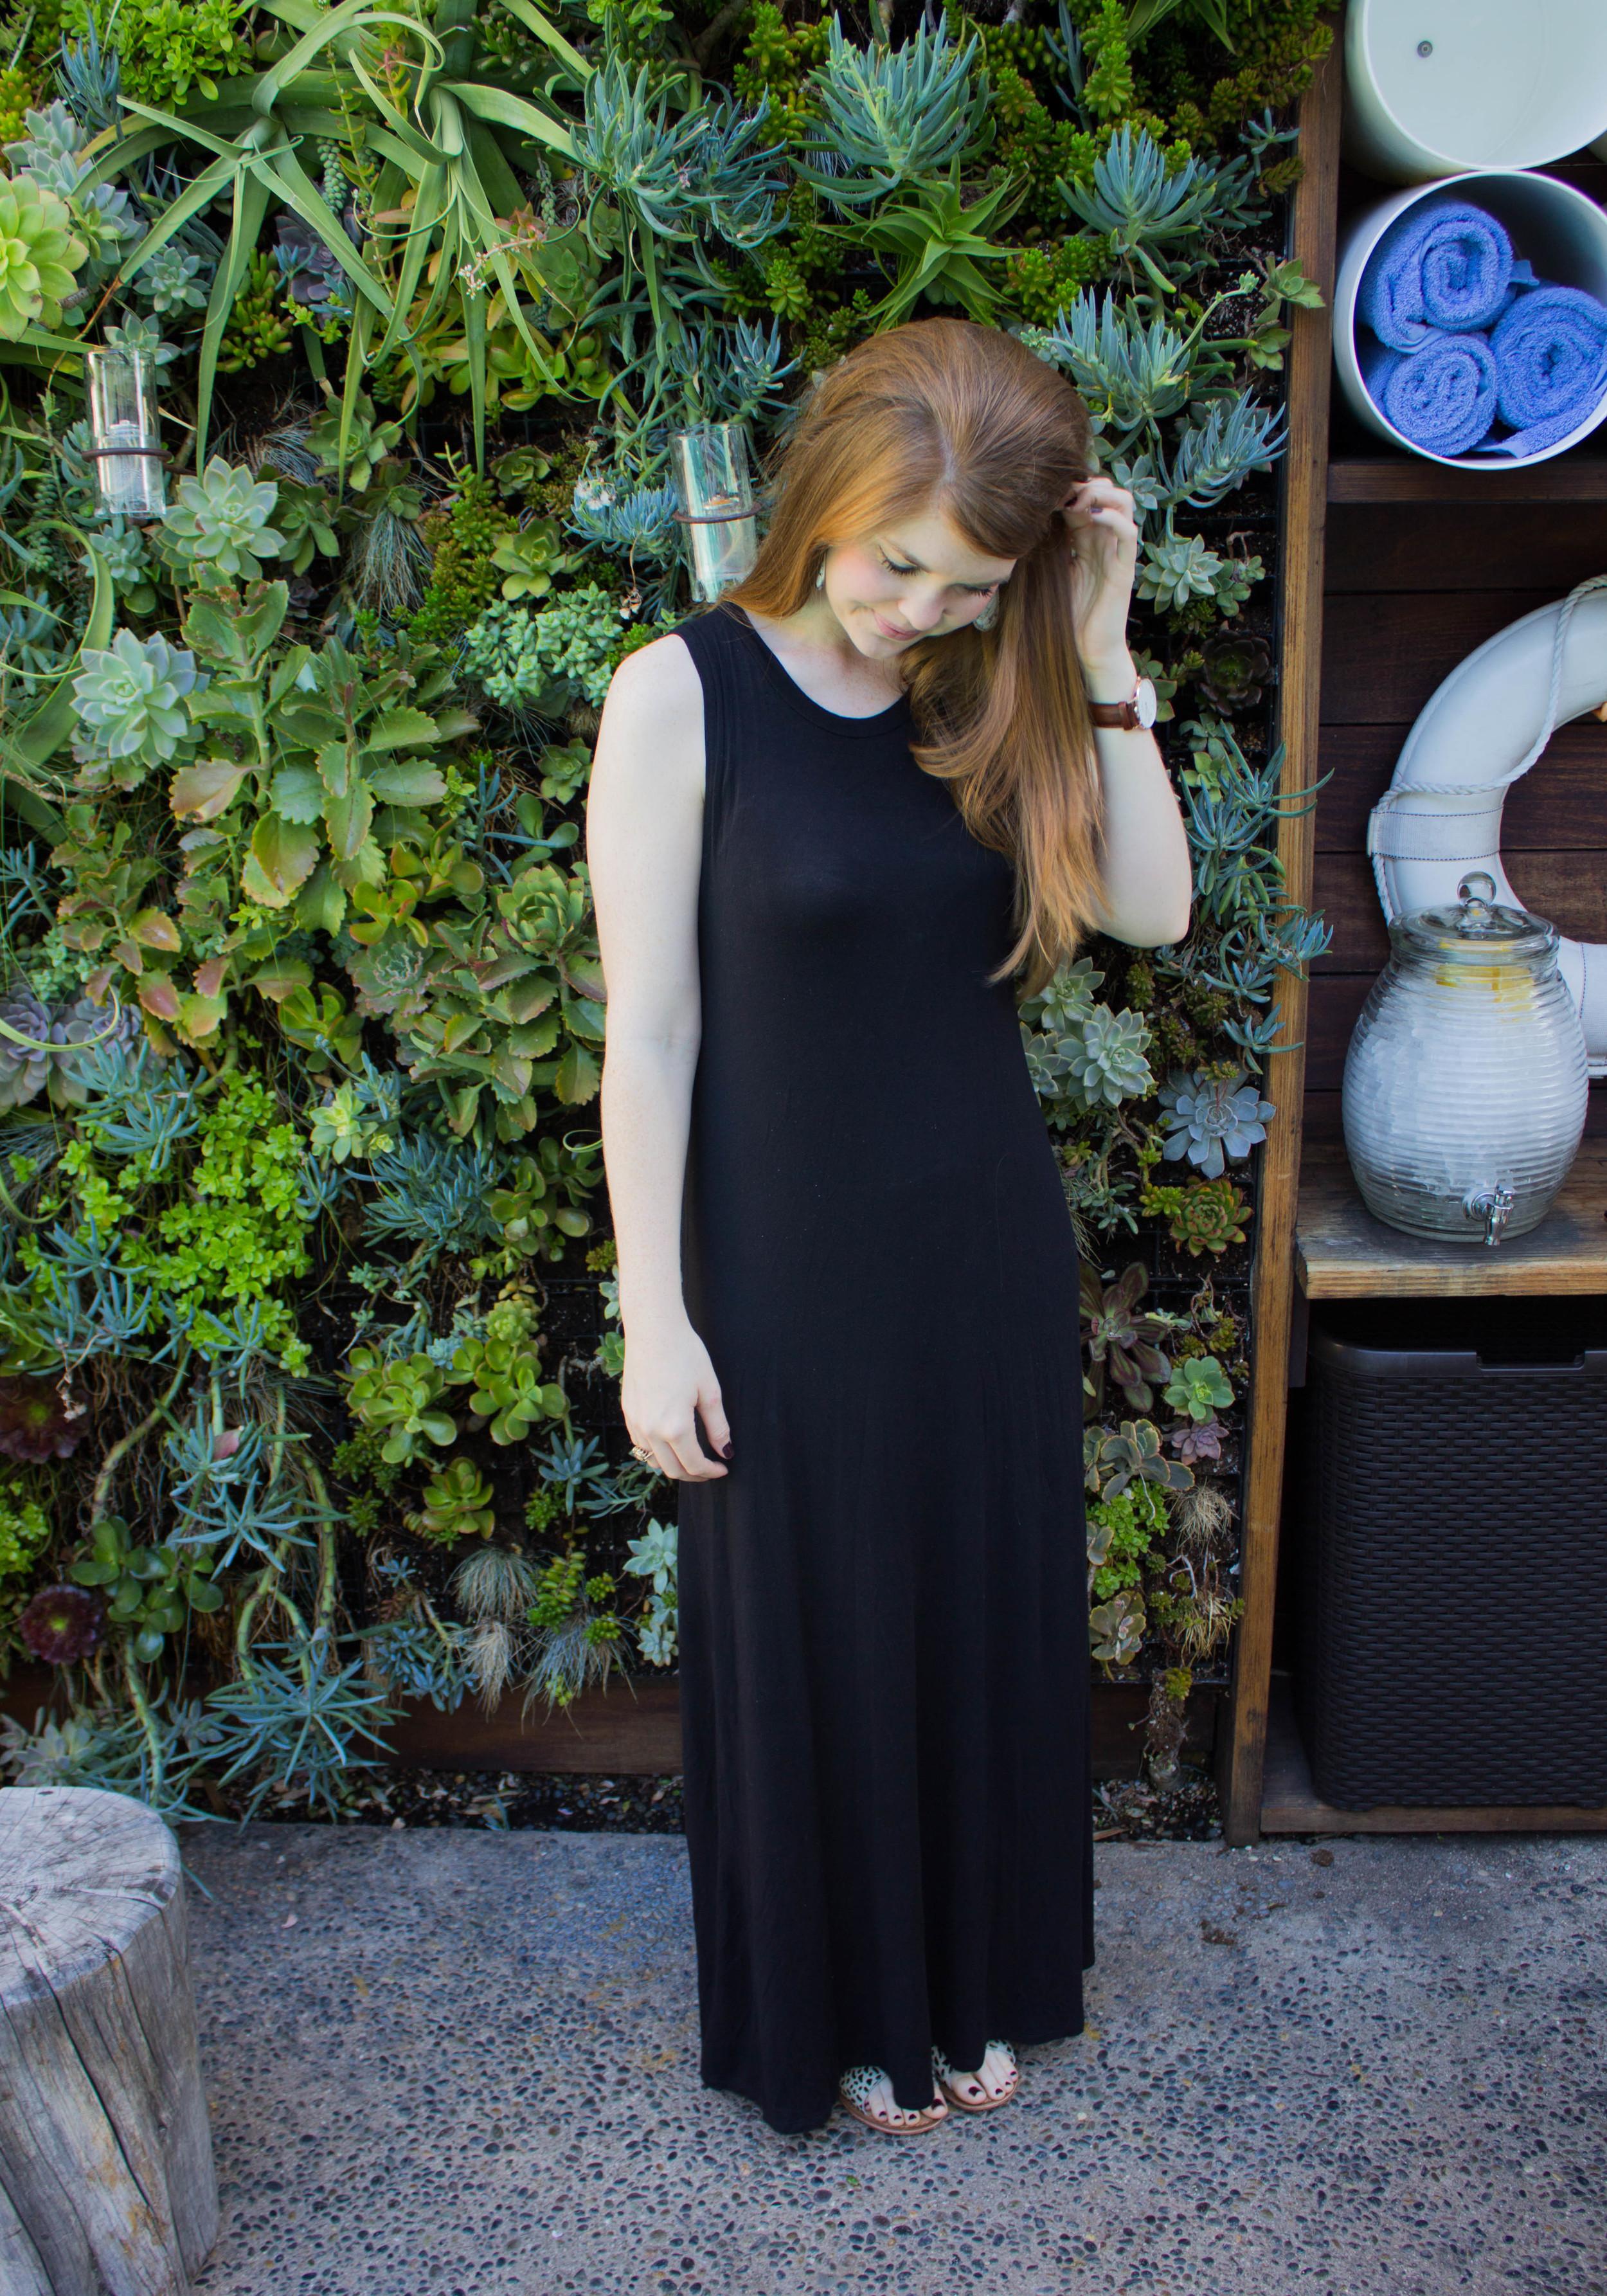 black maxi dress, bc cheetah sandals, Daniel Wellington watch, The Pearl Hotel, San Diego